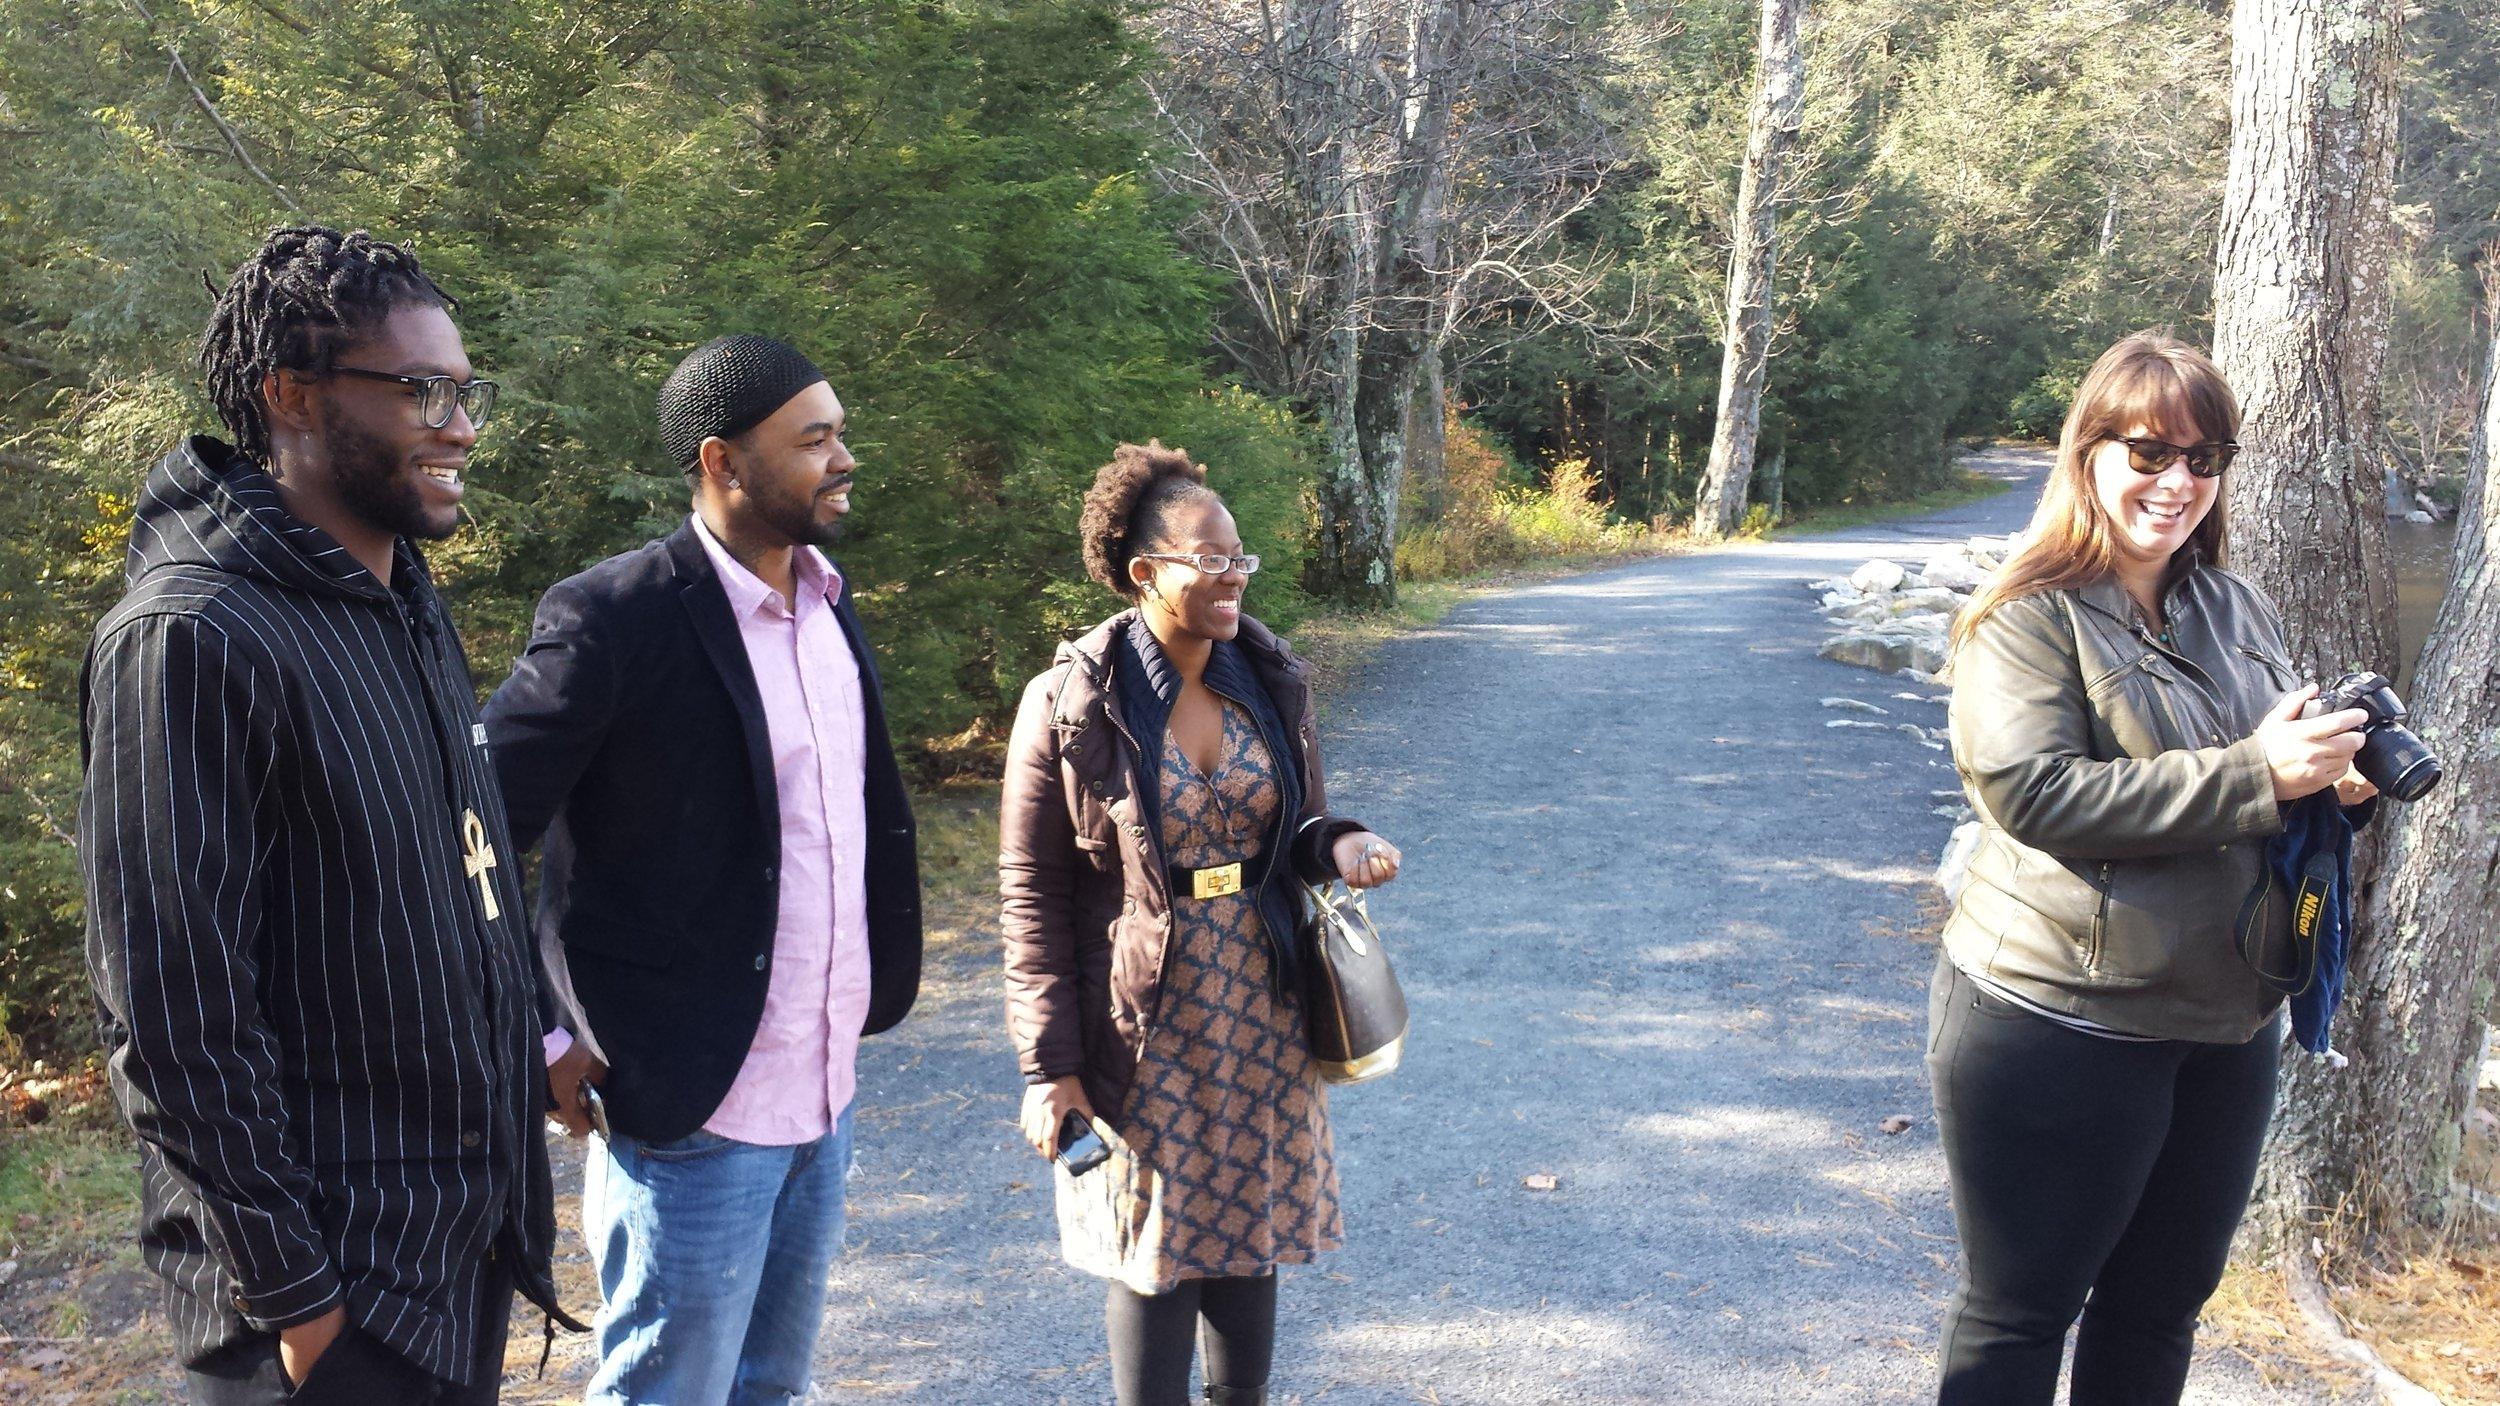 Research Team (L to R) Kondwani Jackson, Brian K Jones, Allison Guess, Eve Tuck. (Not pictured: Mistinguette Smith)